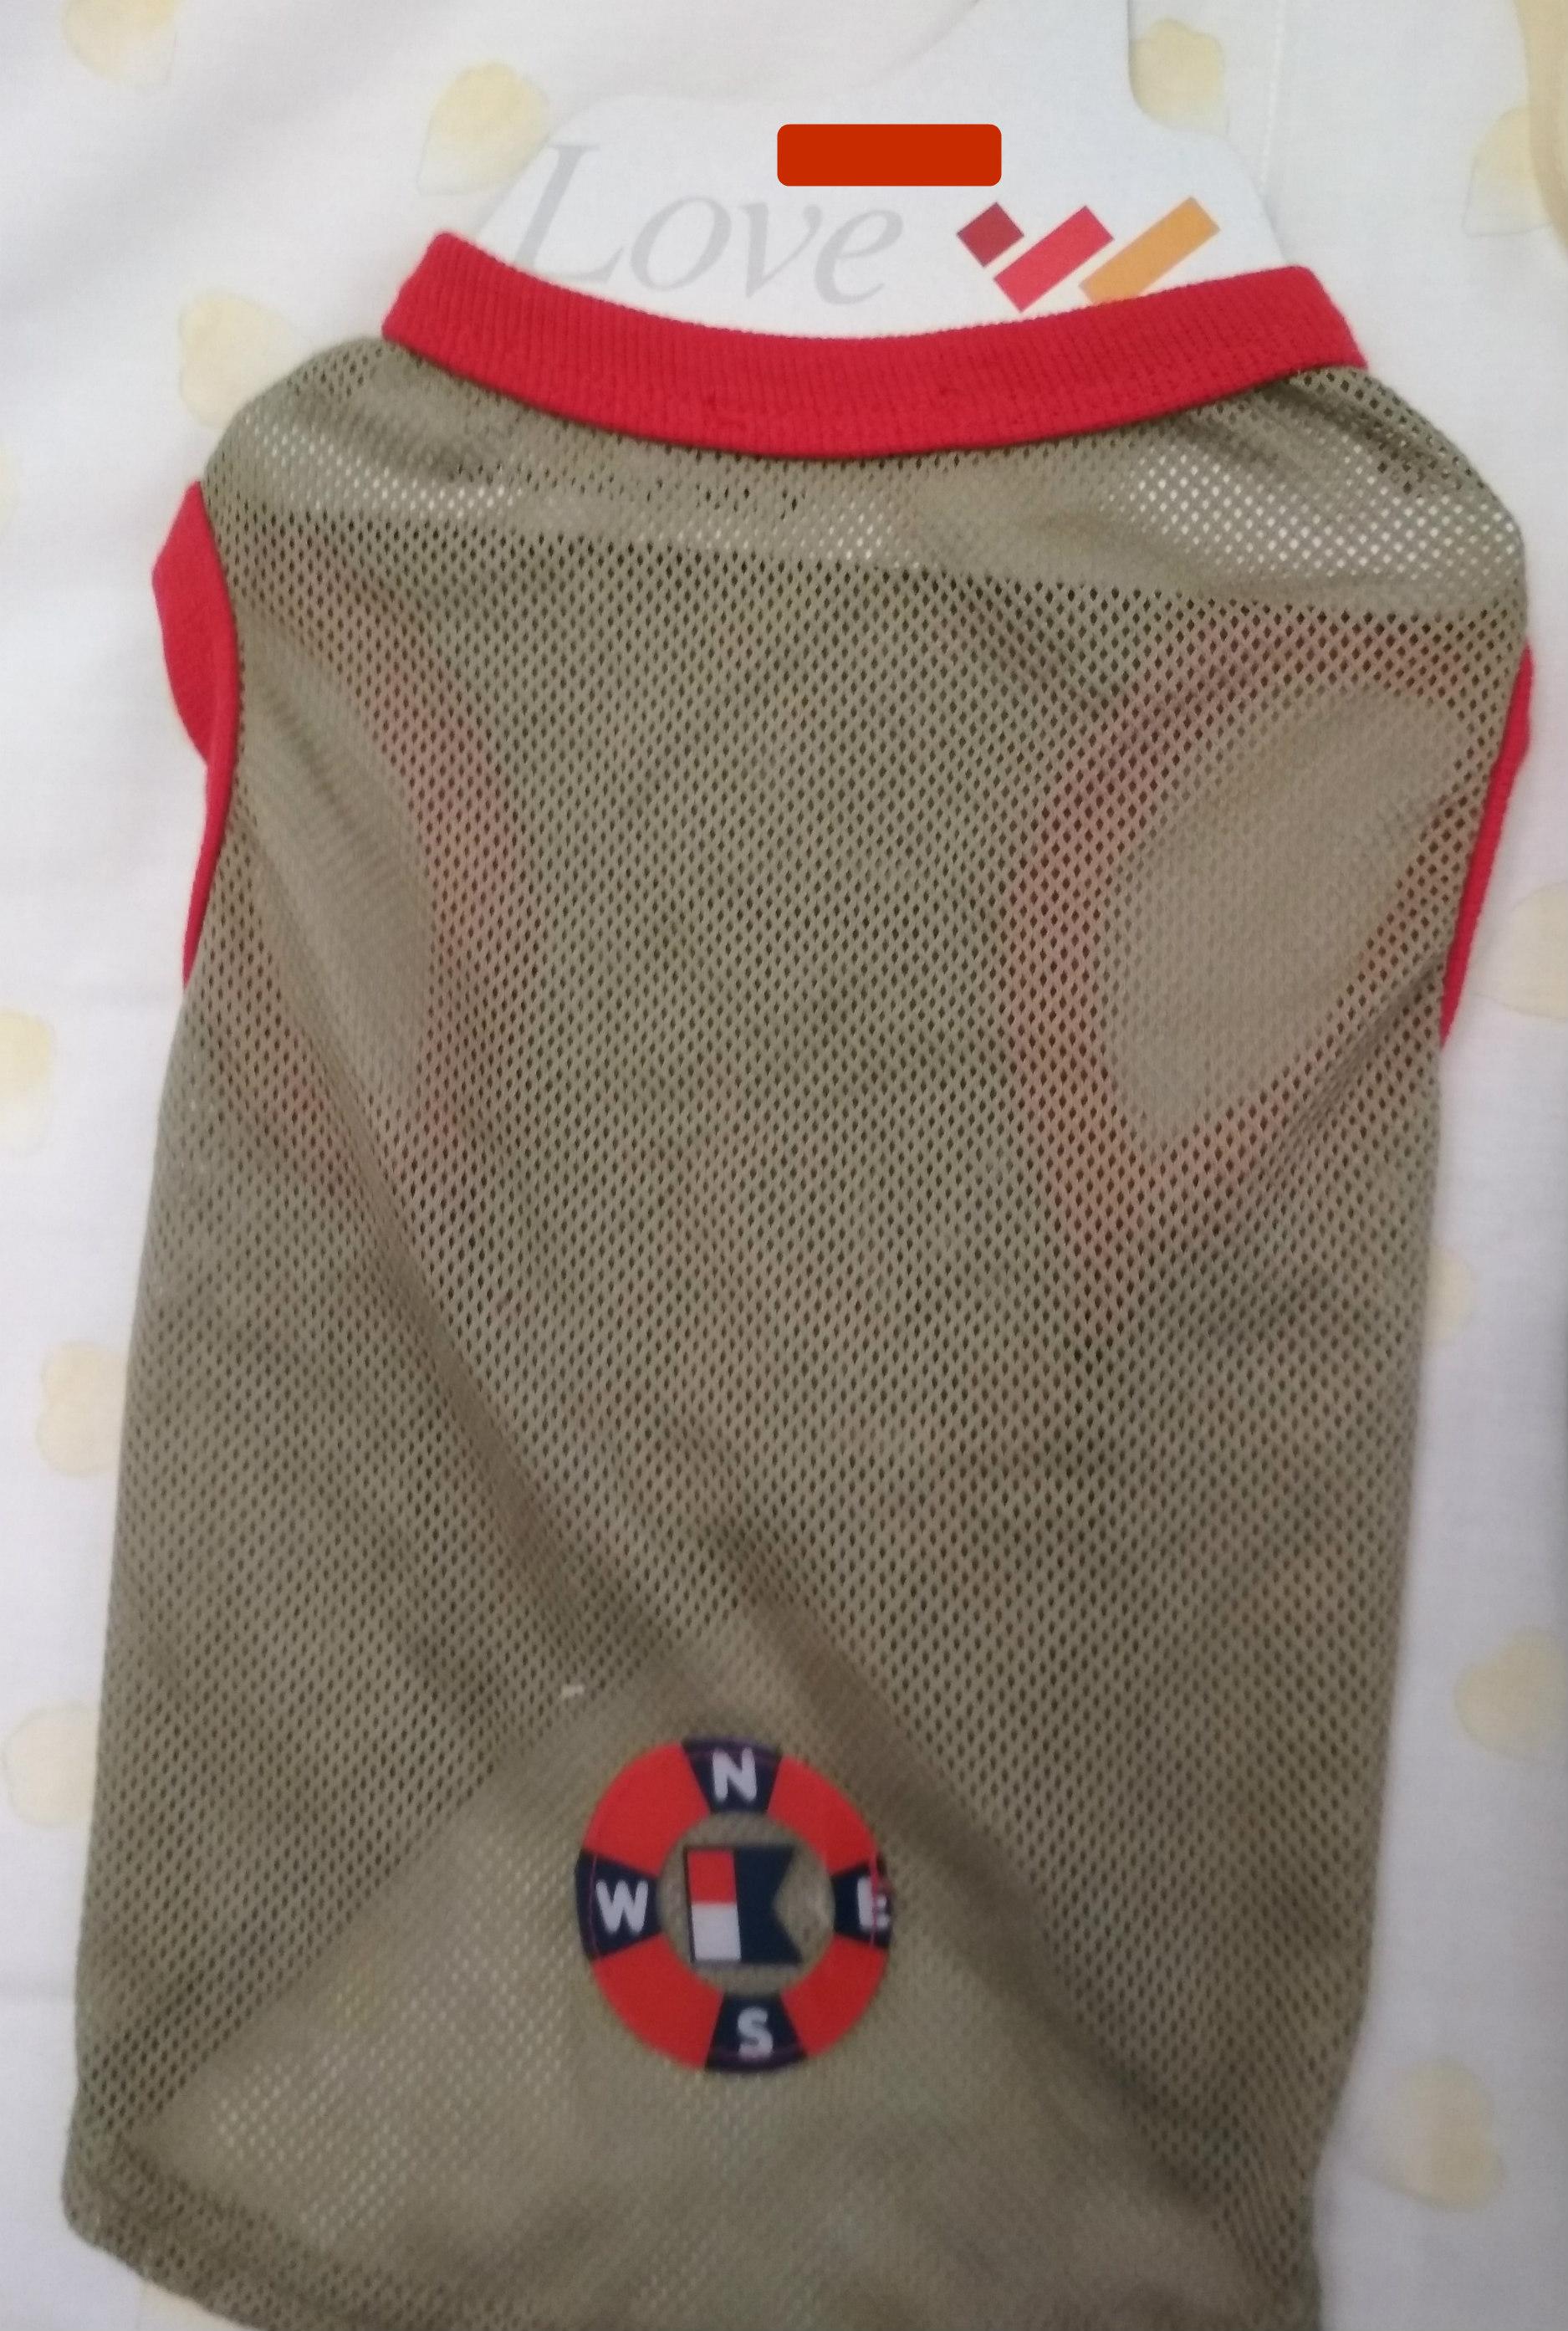 Woofmoda - Αθλητική μπλούζα